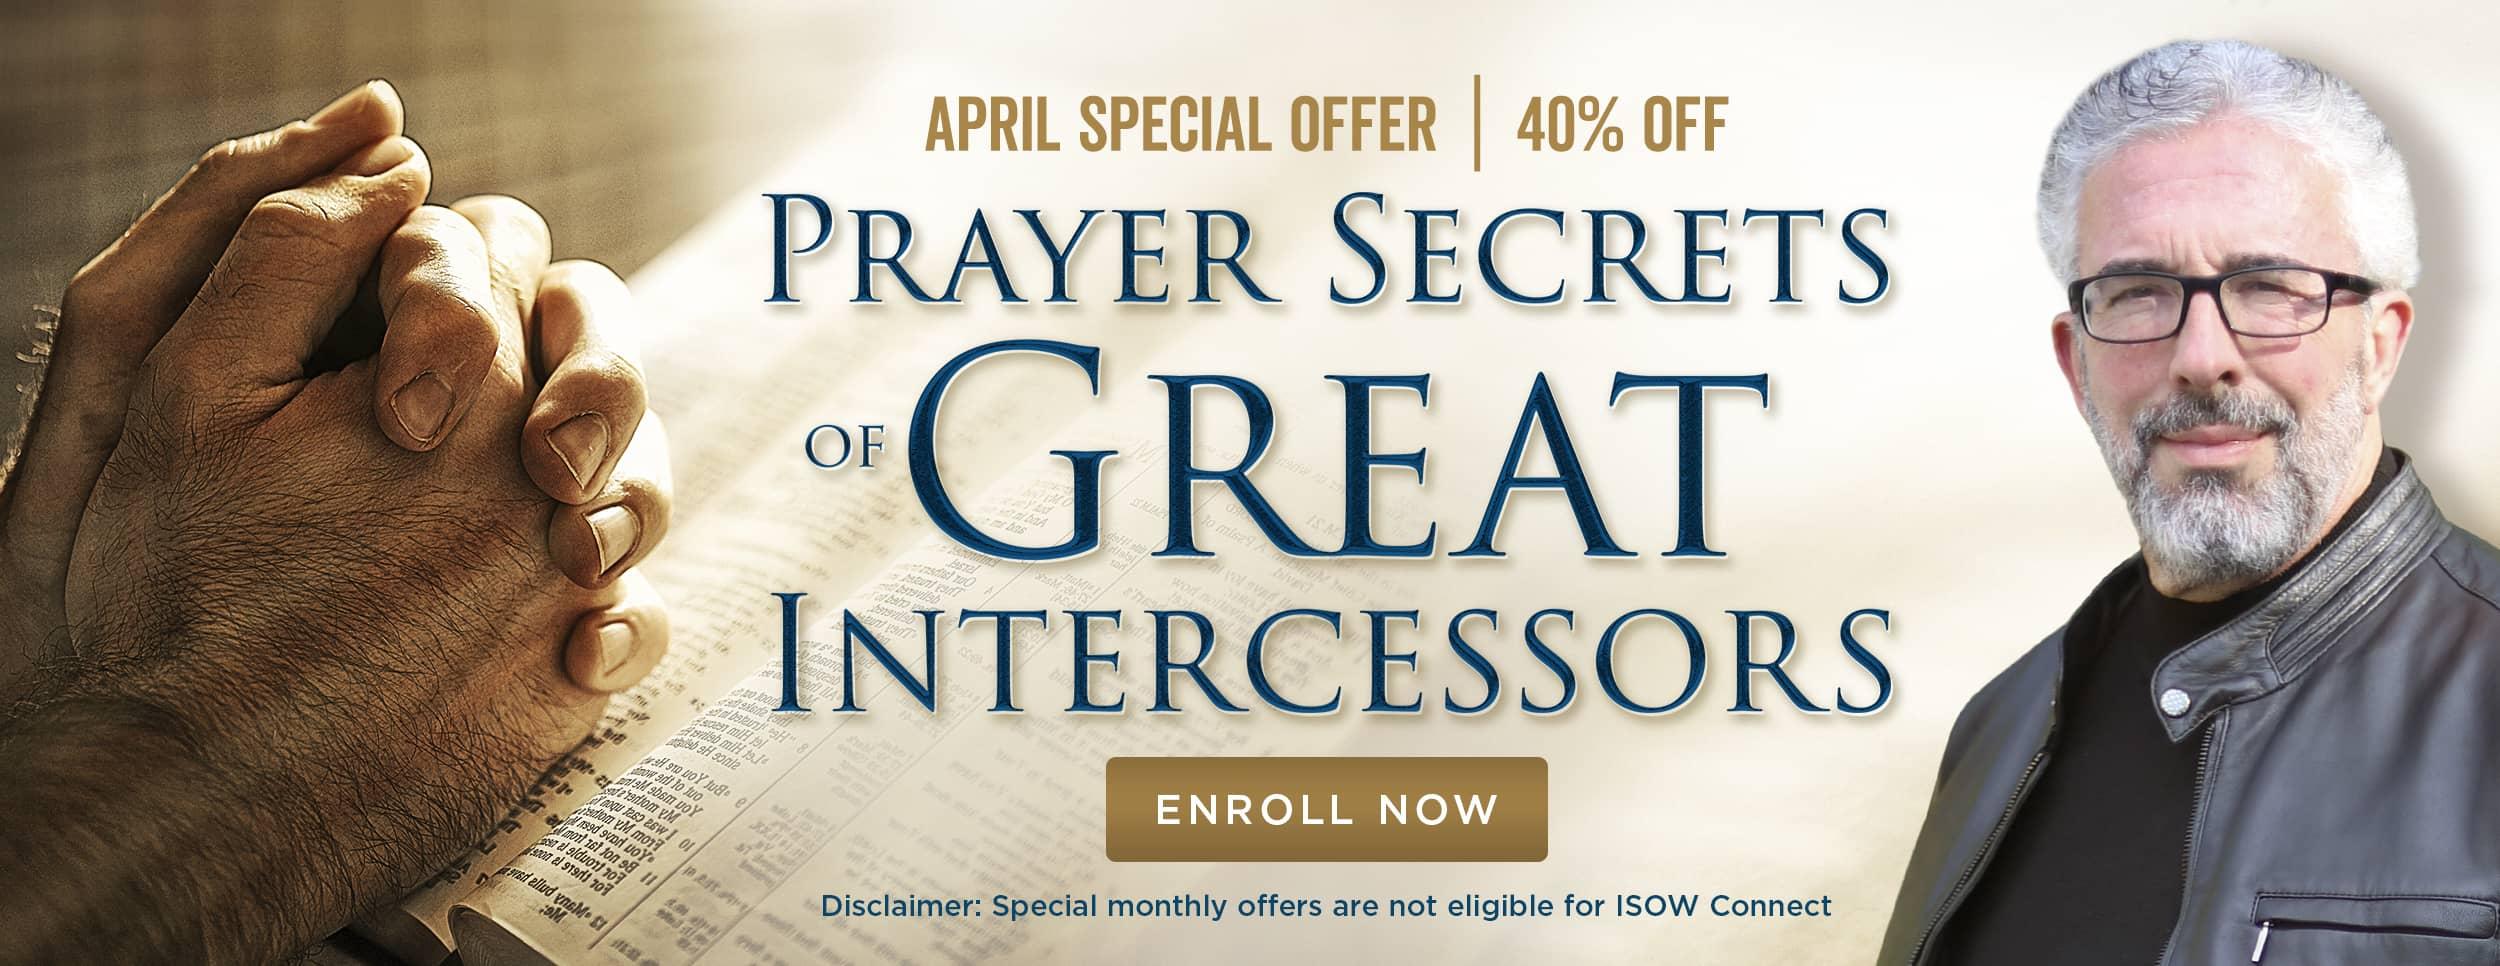 Prayer Secrets of Great Intercessors – Website Banner 2